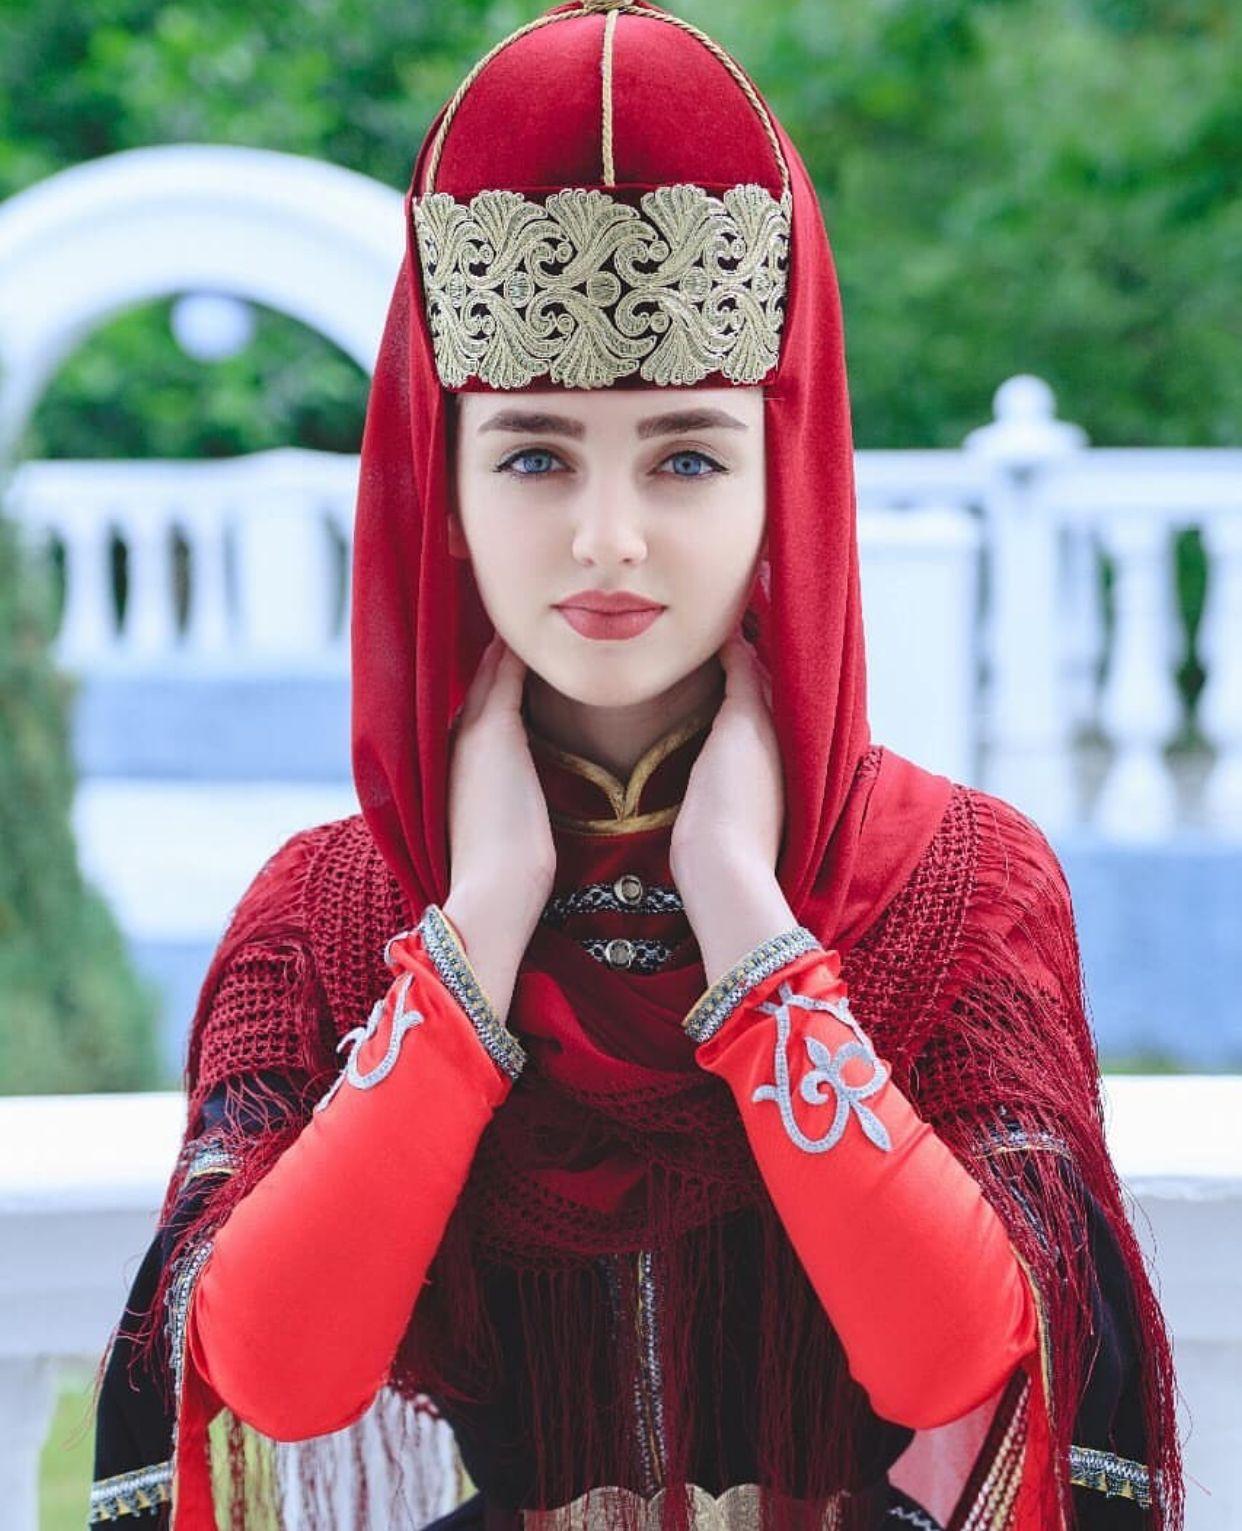 Circassian Beauties